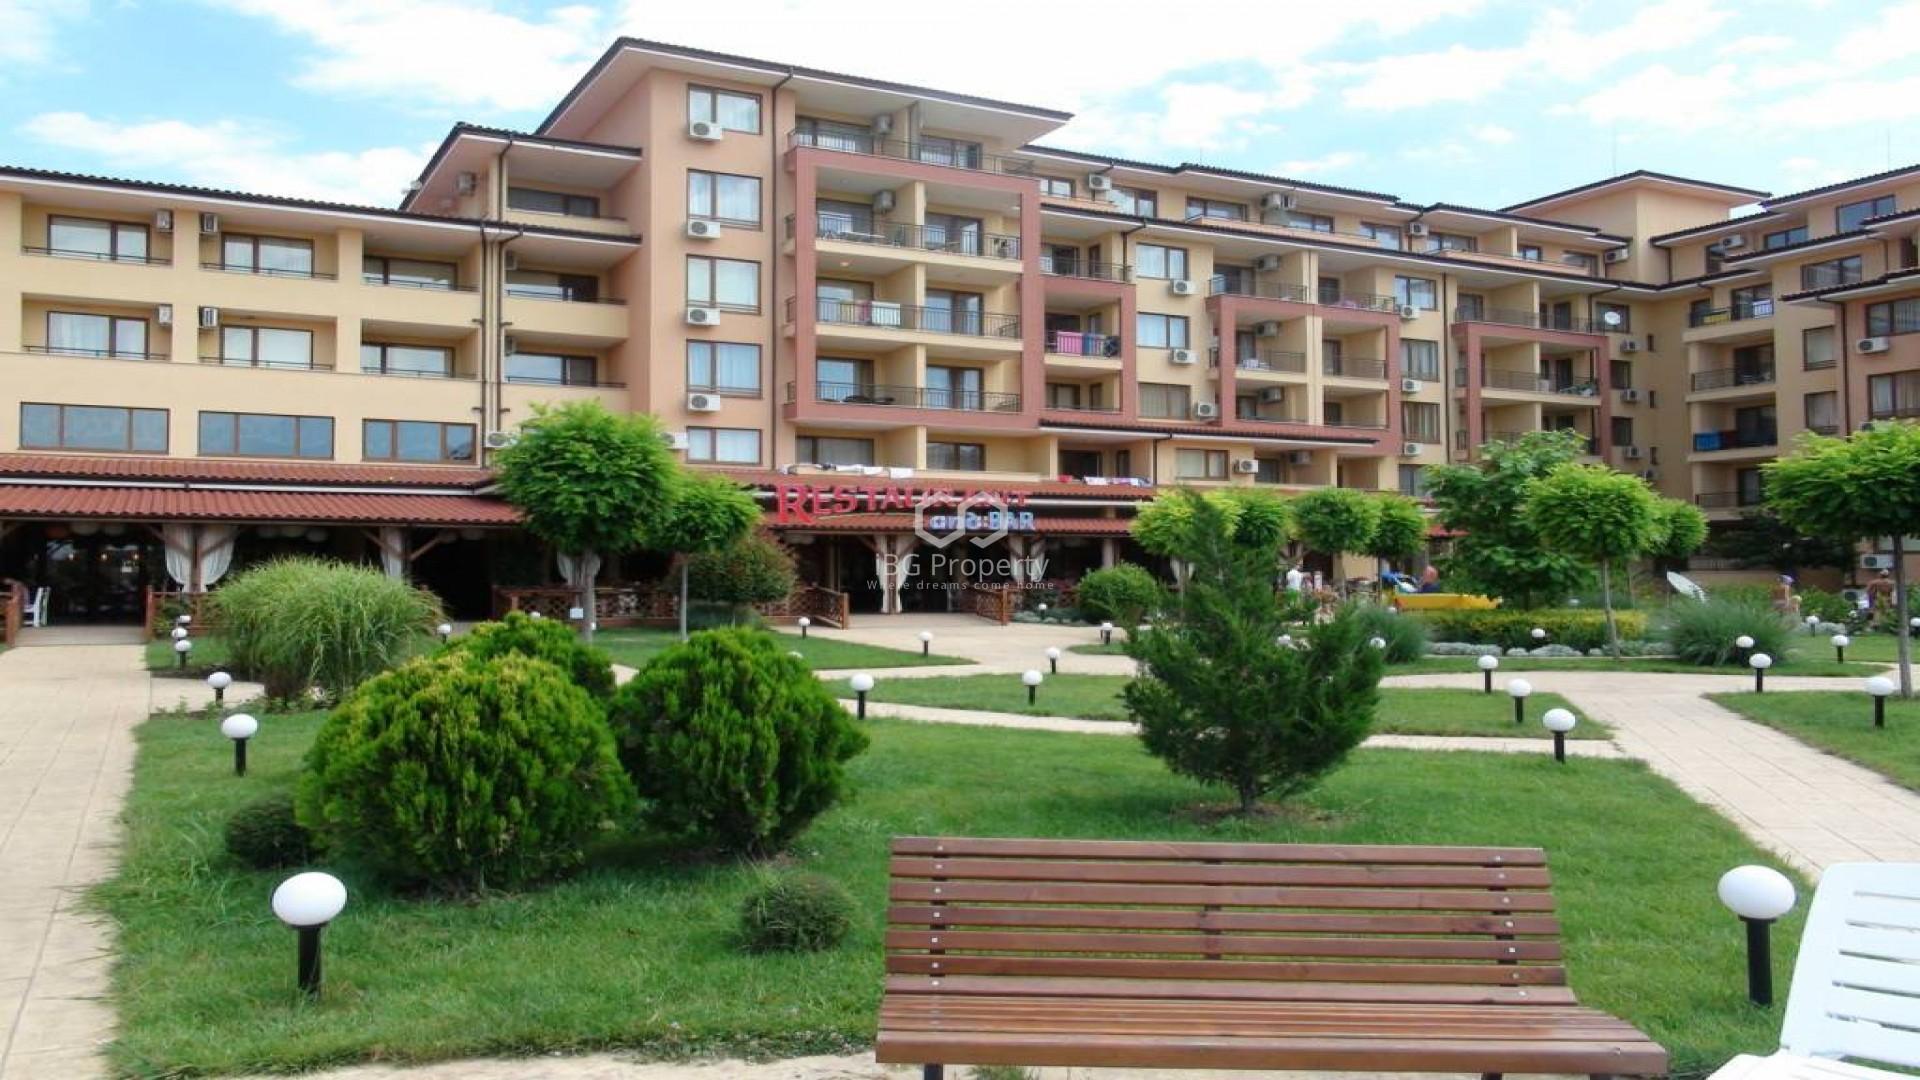 Двухкомнатная квартира Святой Влас 53m2